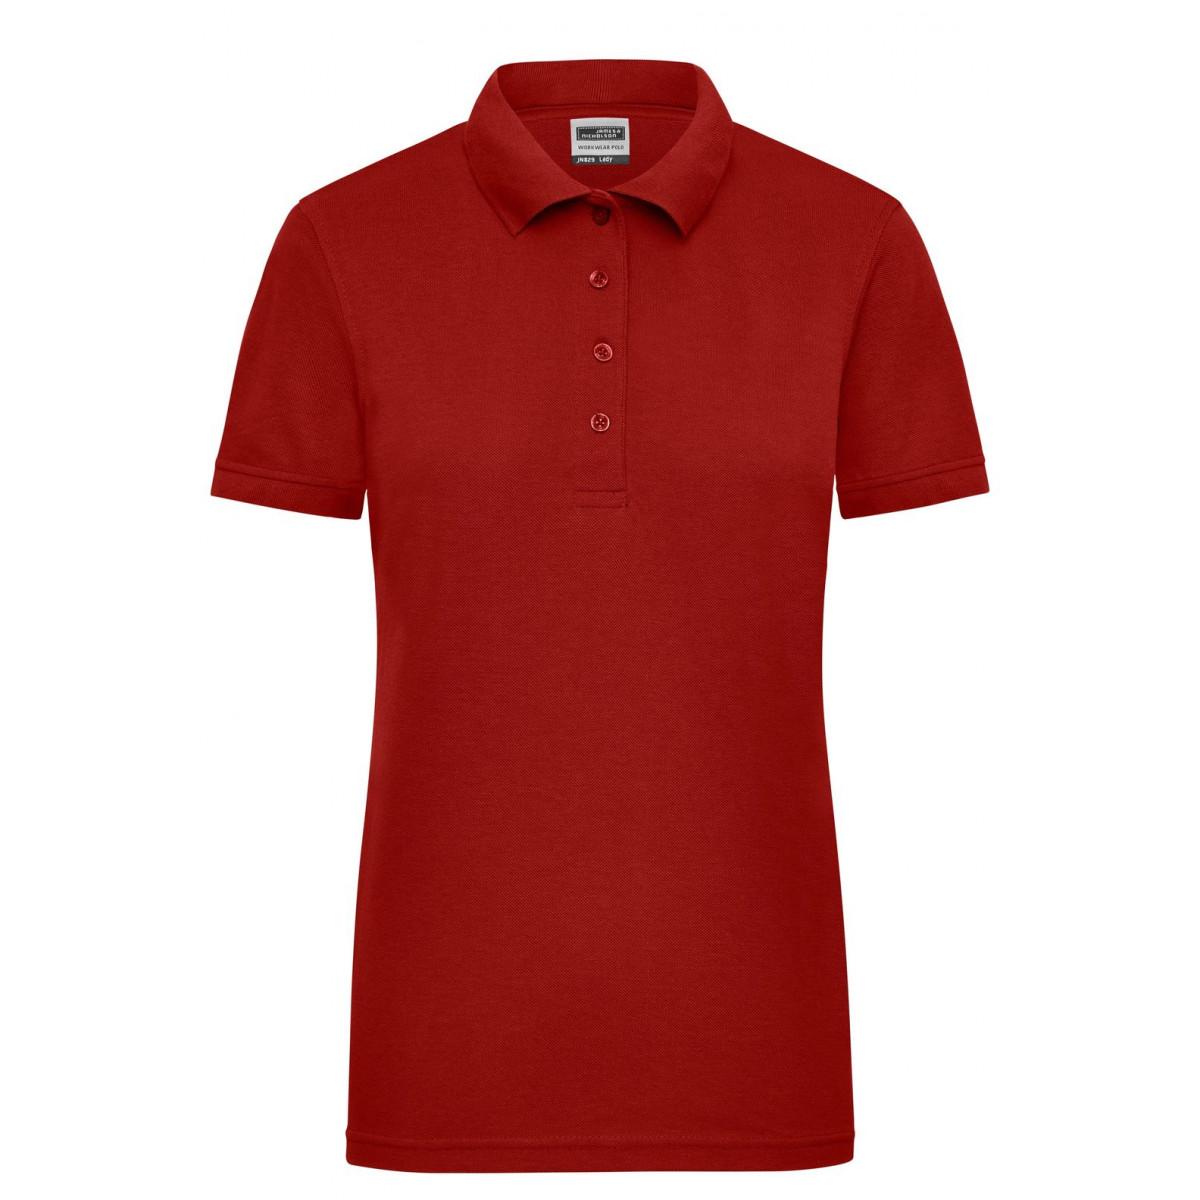 Рубашка поло женская JN829 Ladies Workwear Polo - Бордовый